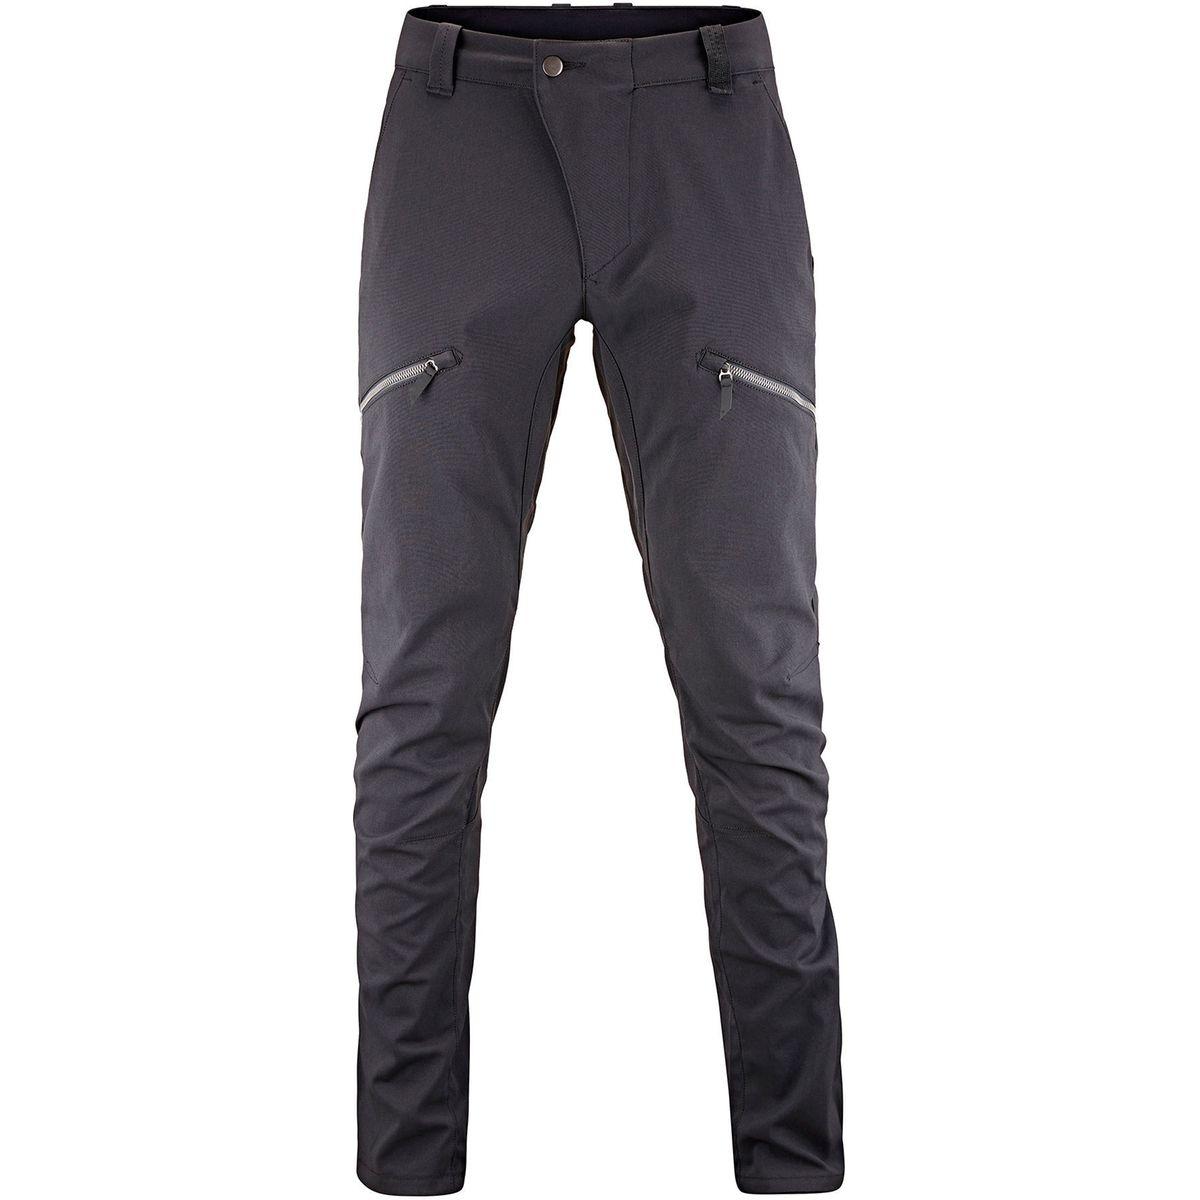 Dvalin - Pantalon long Homme - noir